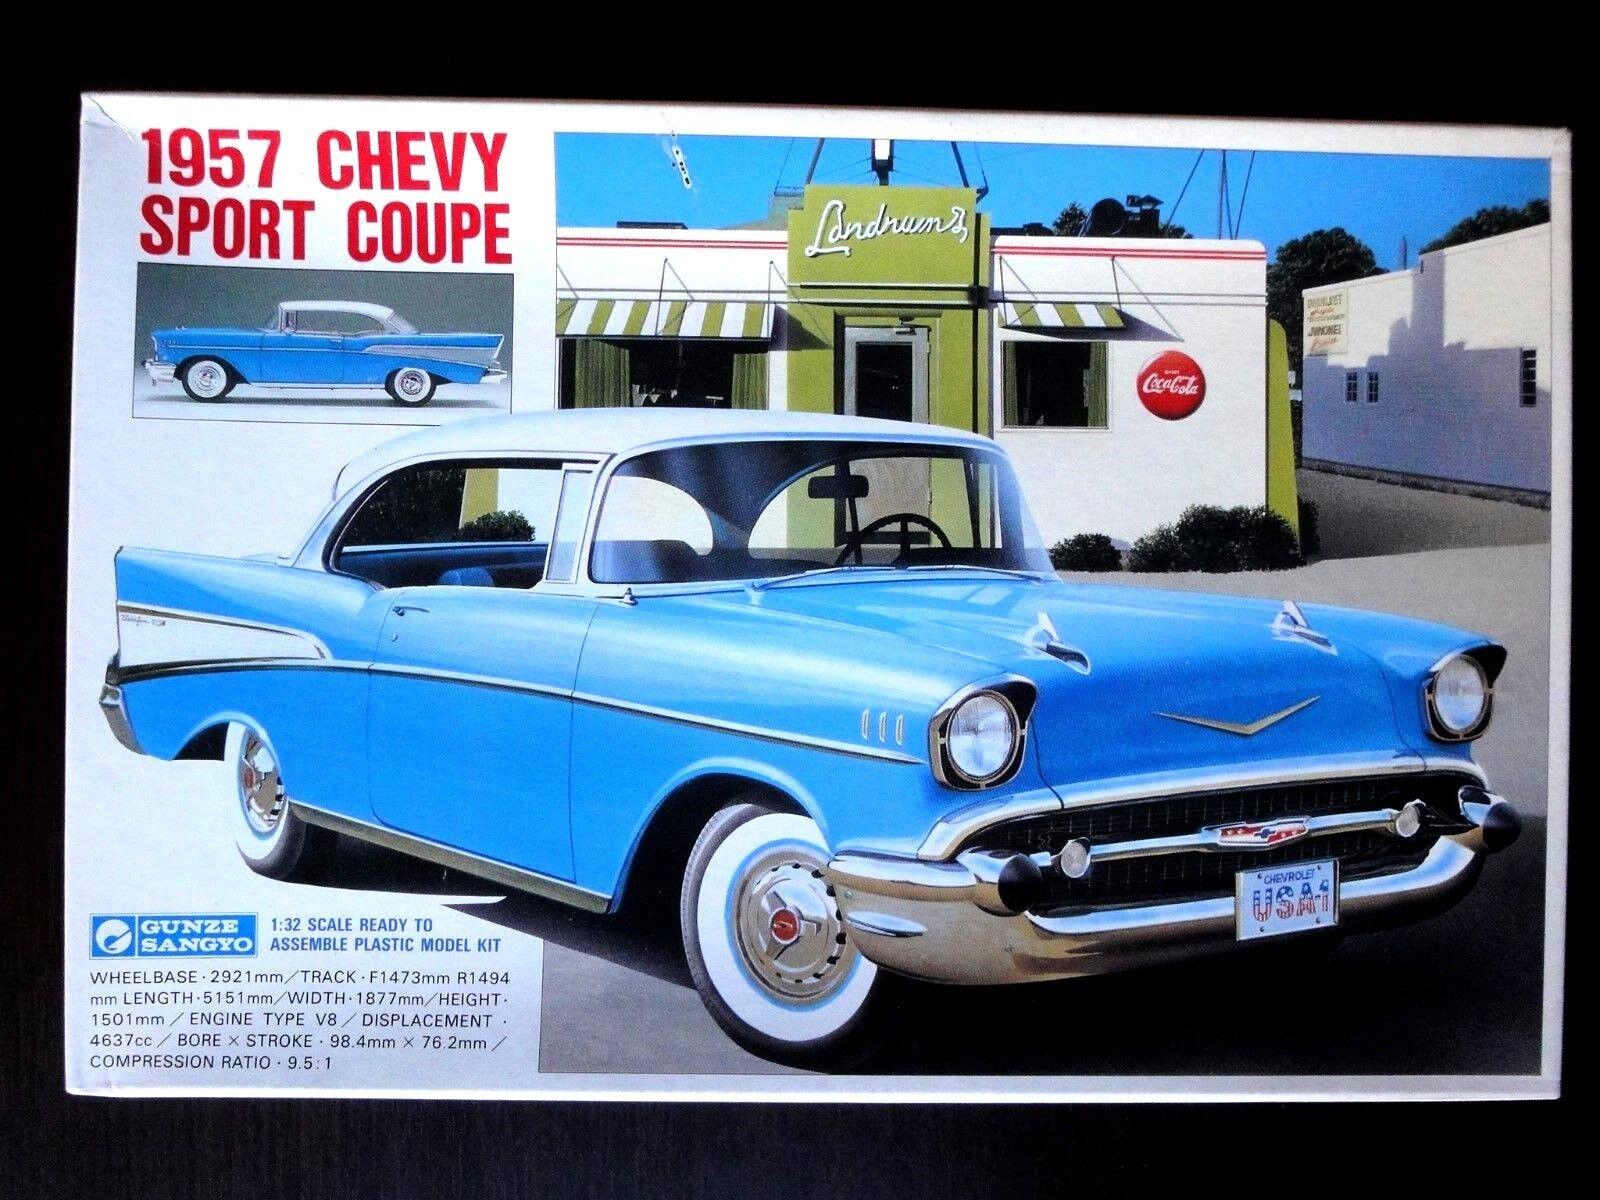 GUNZE 1 32 Chevrolet '57 CHEVY Sport Coupe HISTORIC Car Ultra Rare Vintage